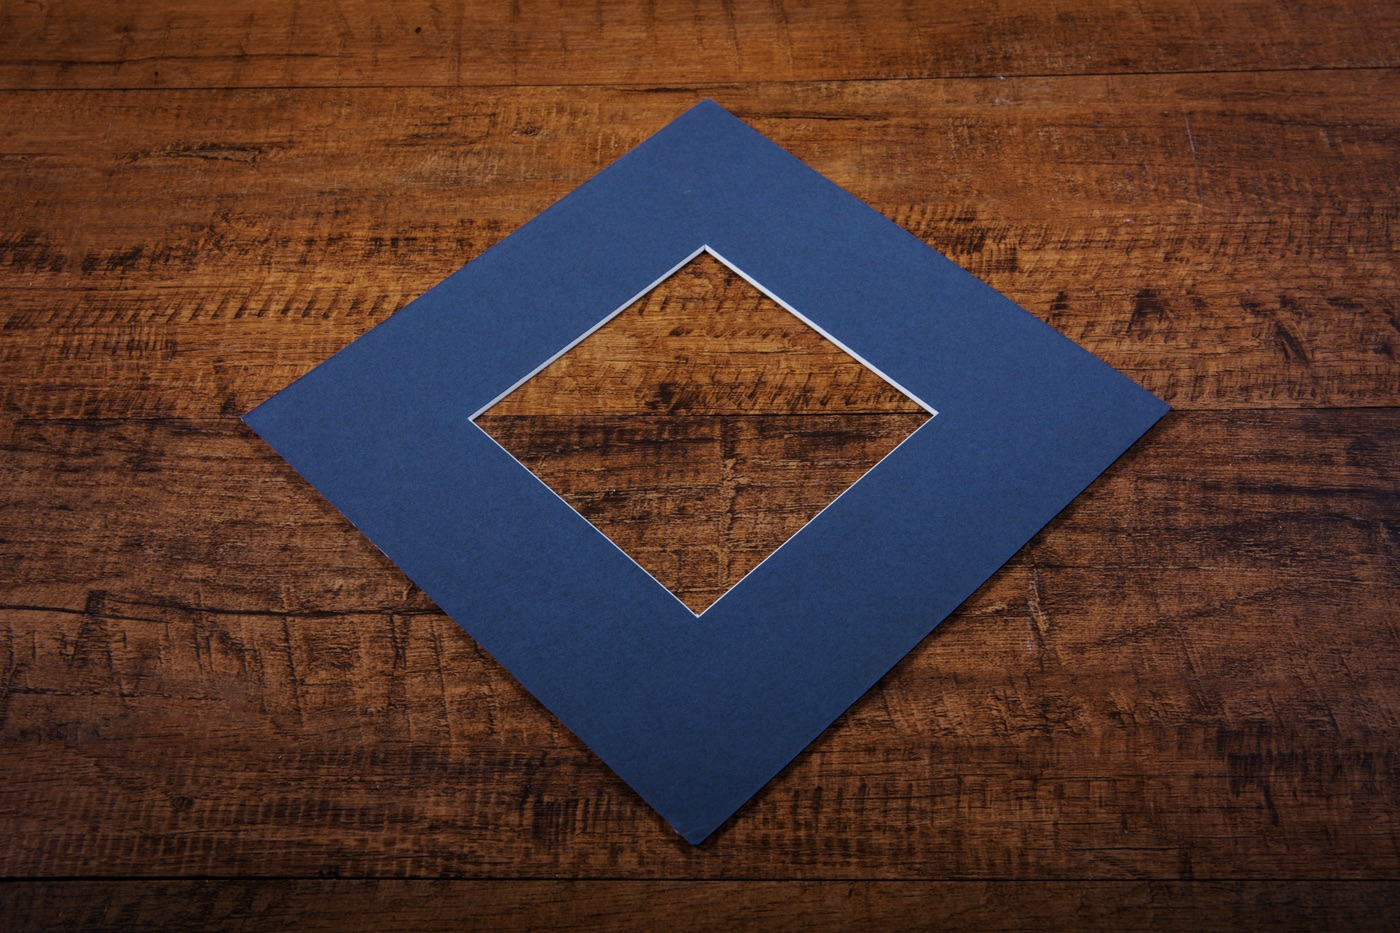 Charcoal Mount Board